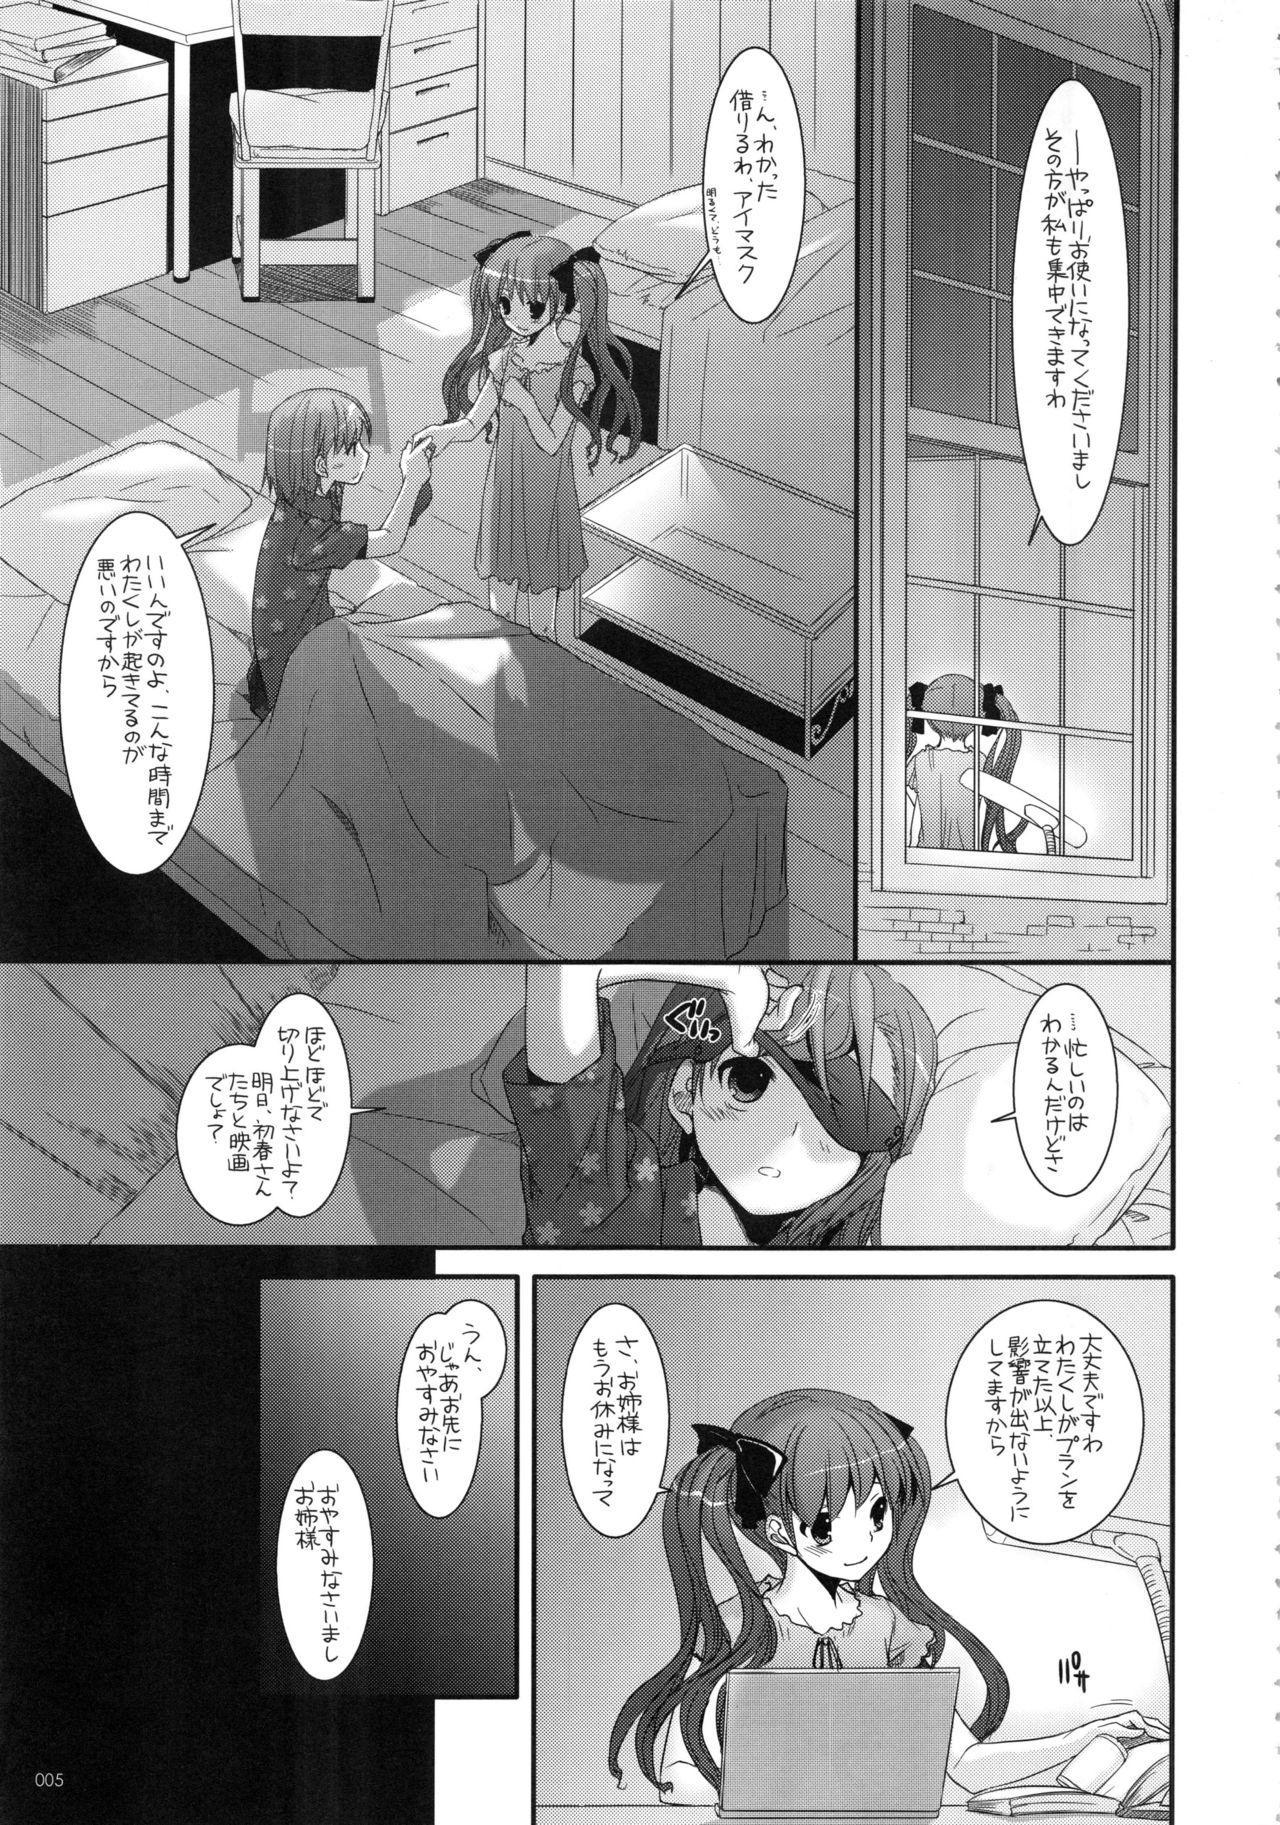 DL - Toaru Soushuuhen 3